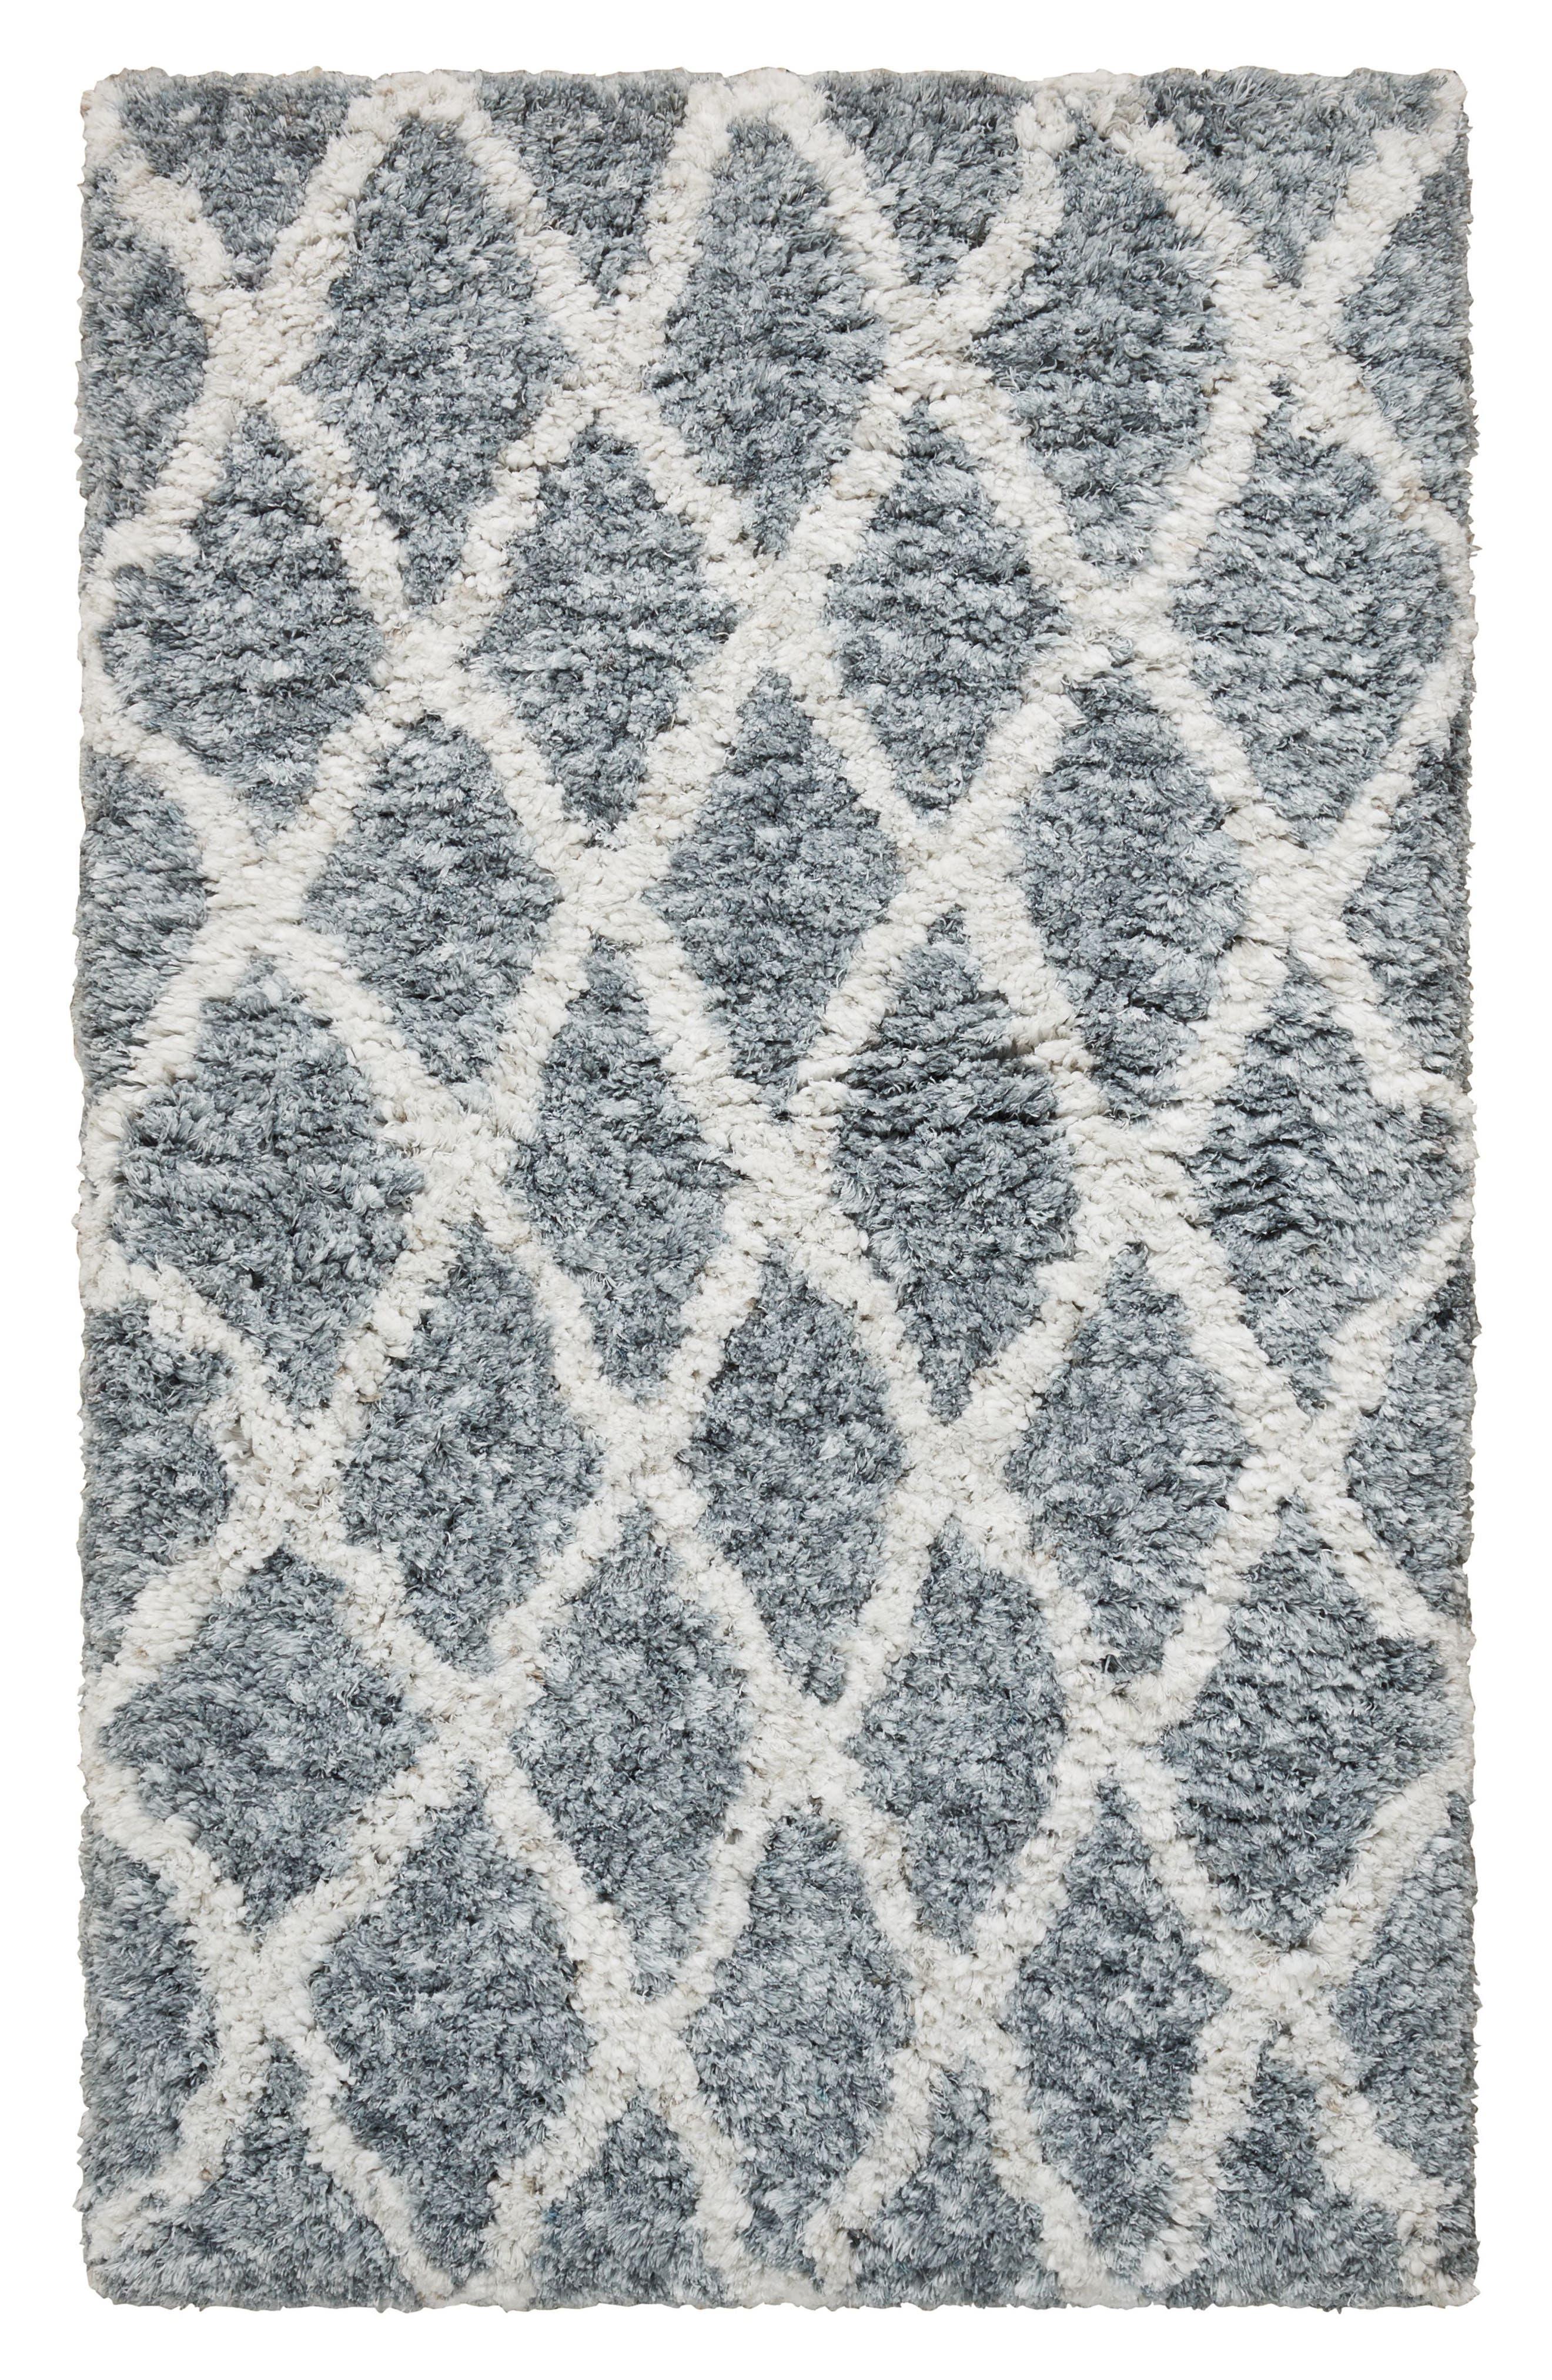 Irregular Diamond Rug,                         Main,                         color, Grey